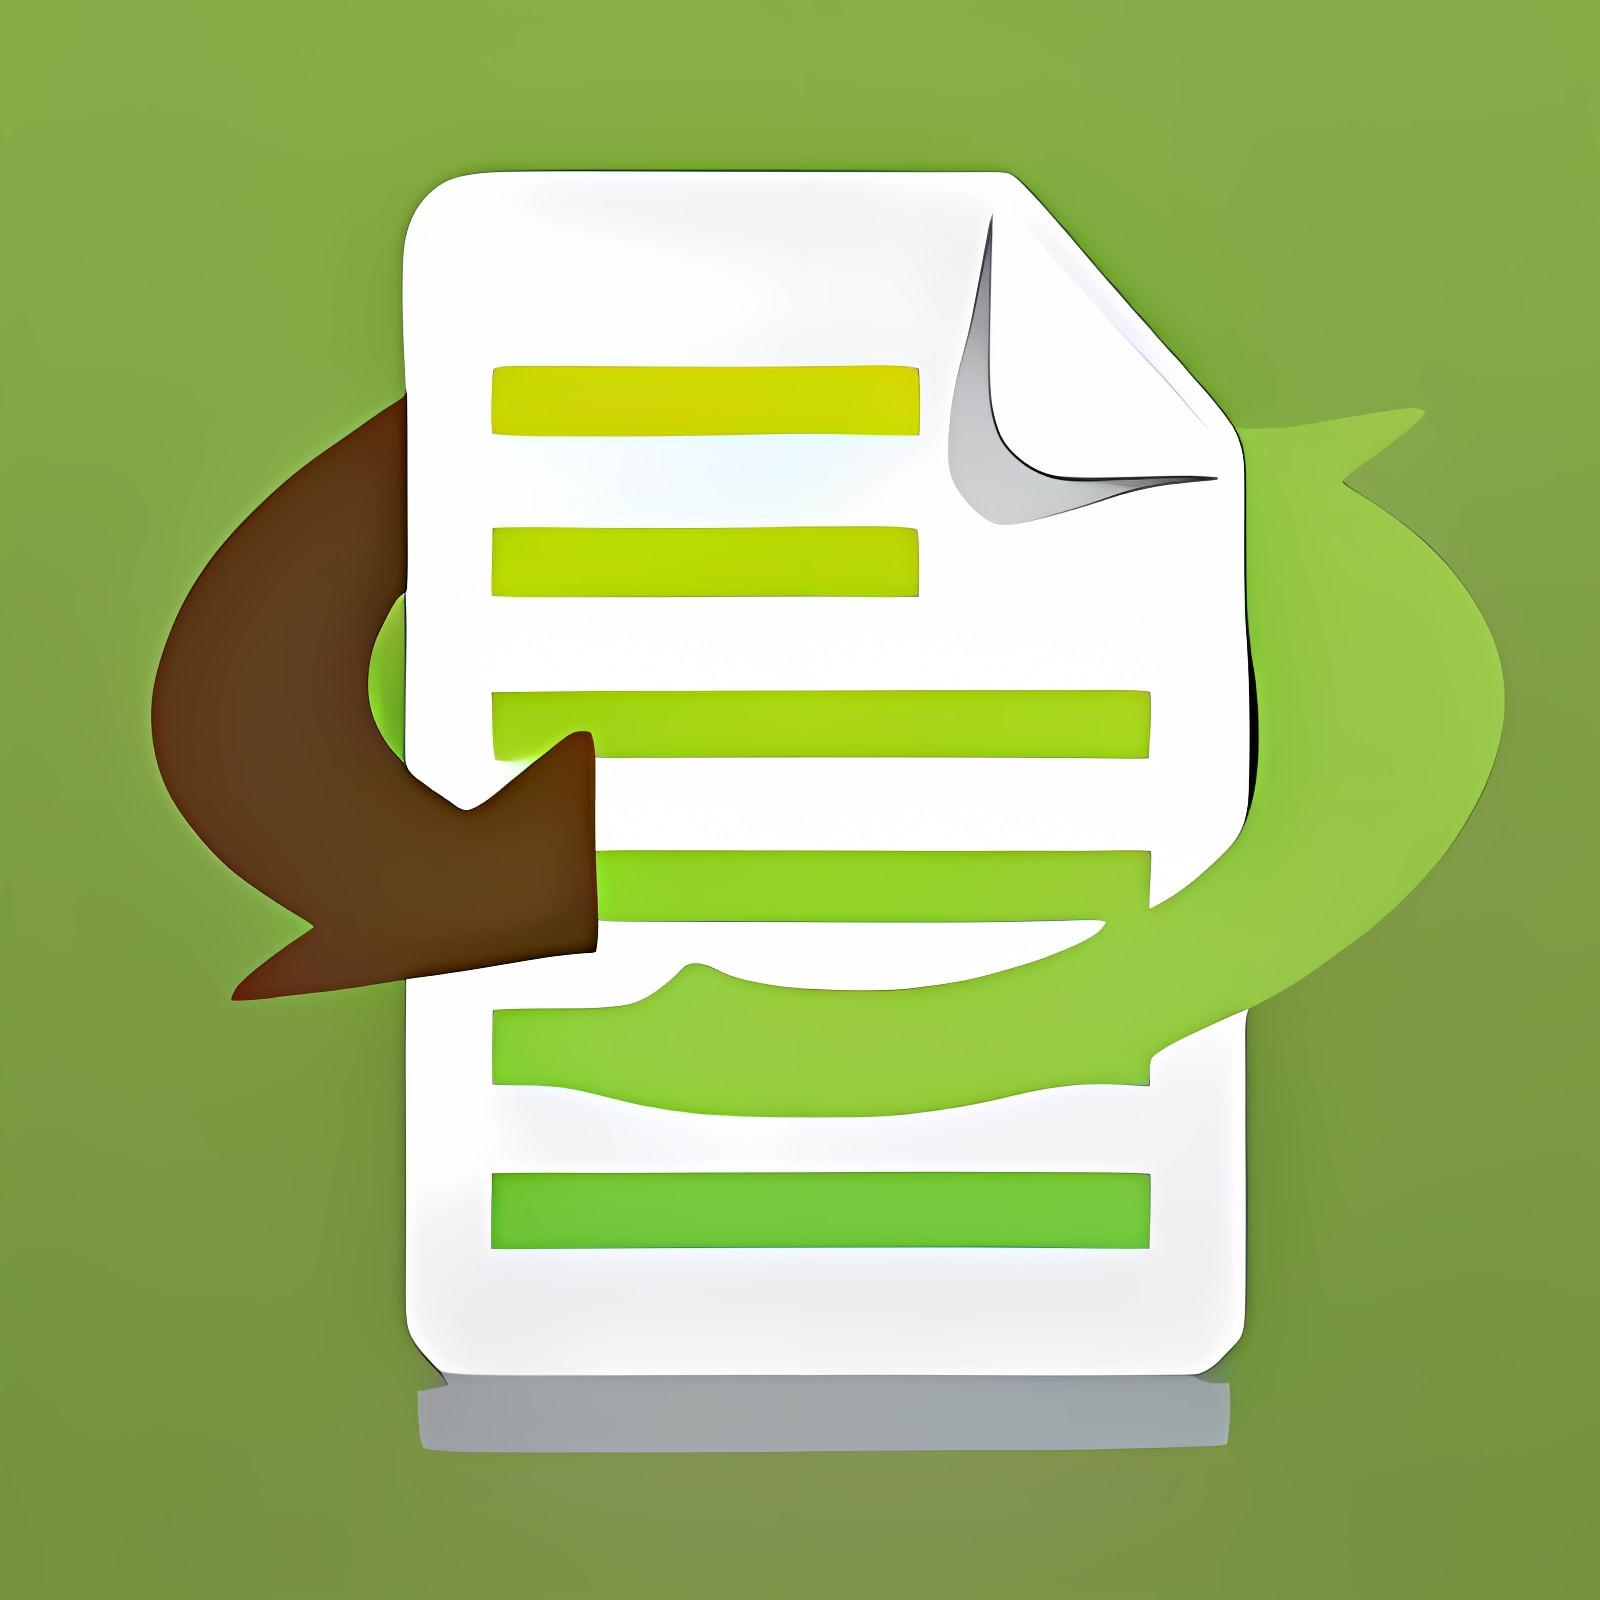 NoteSync 1.1.0 Beta